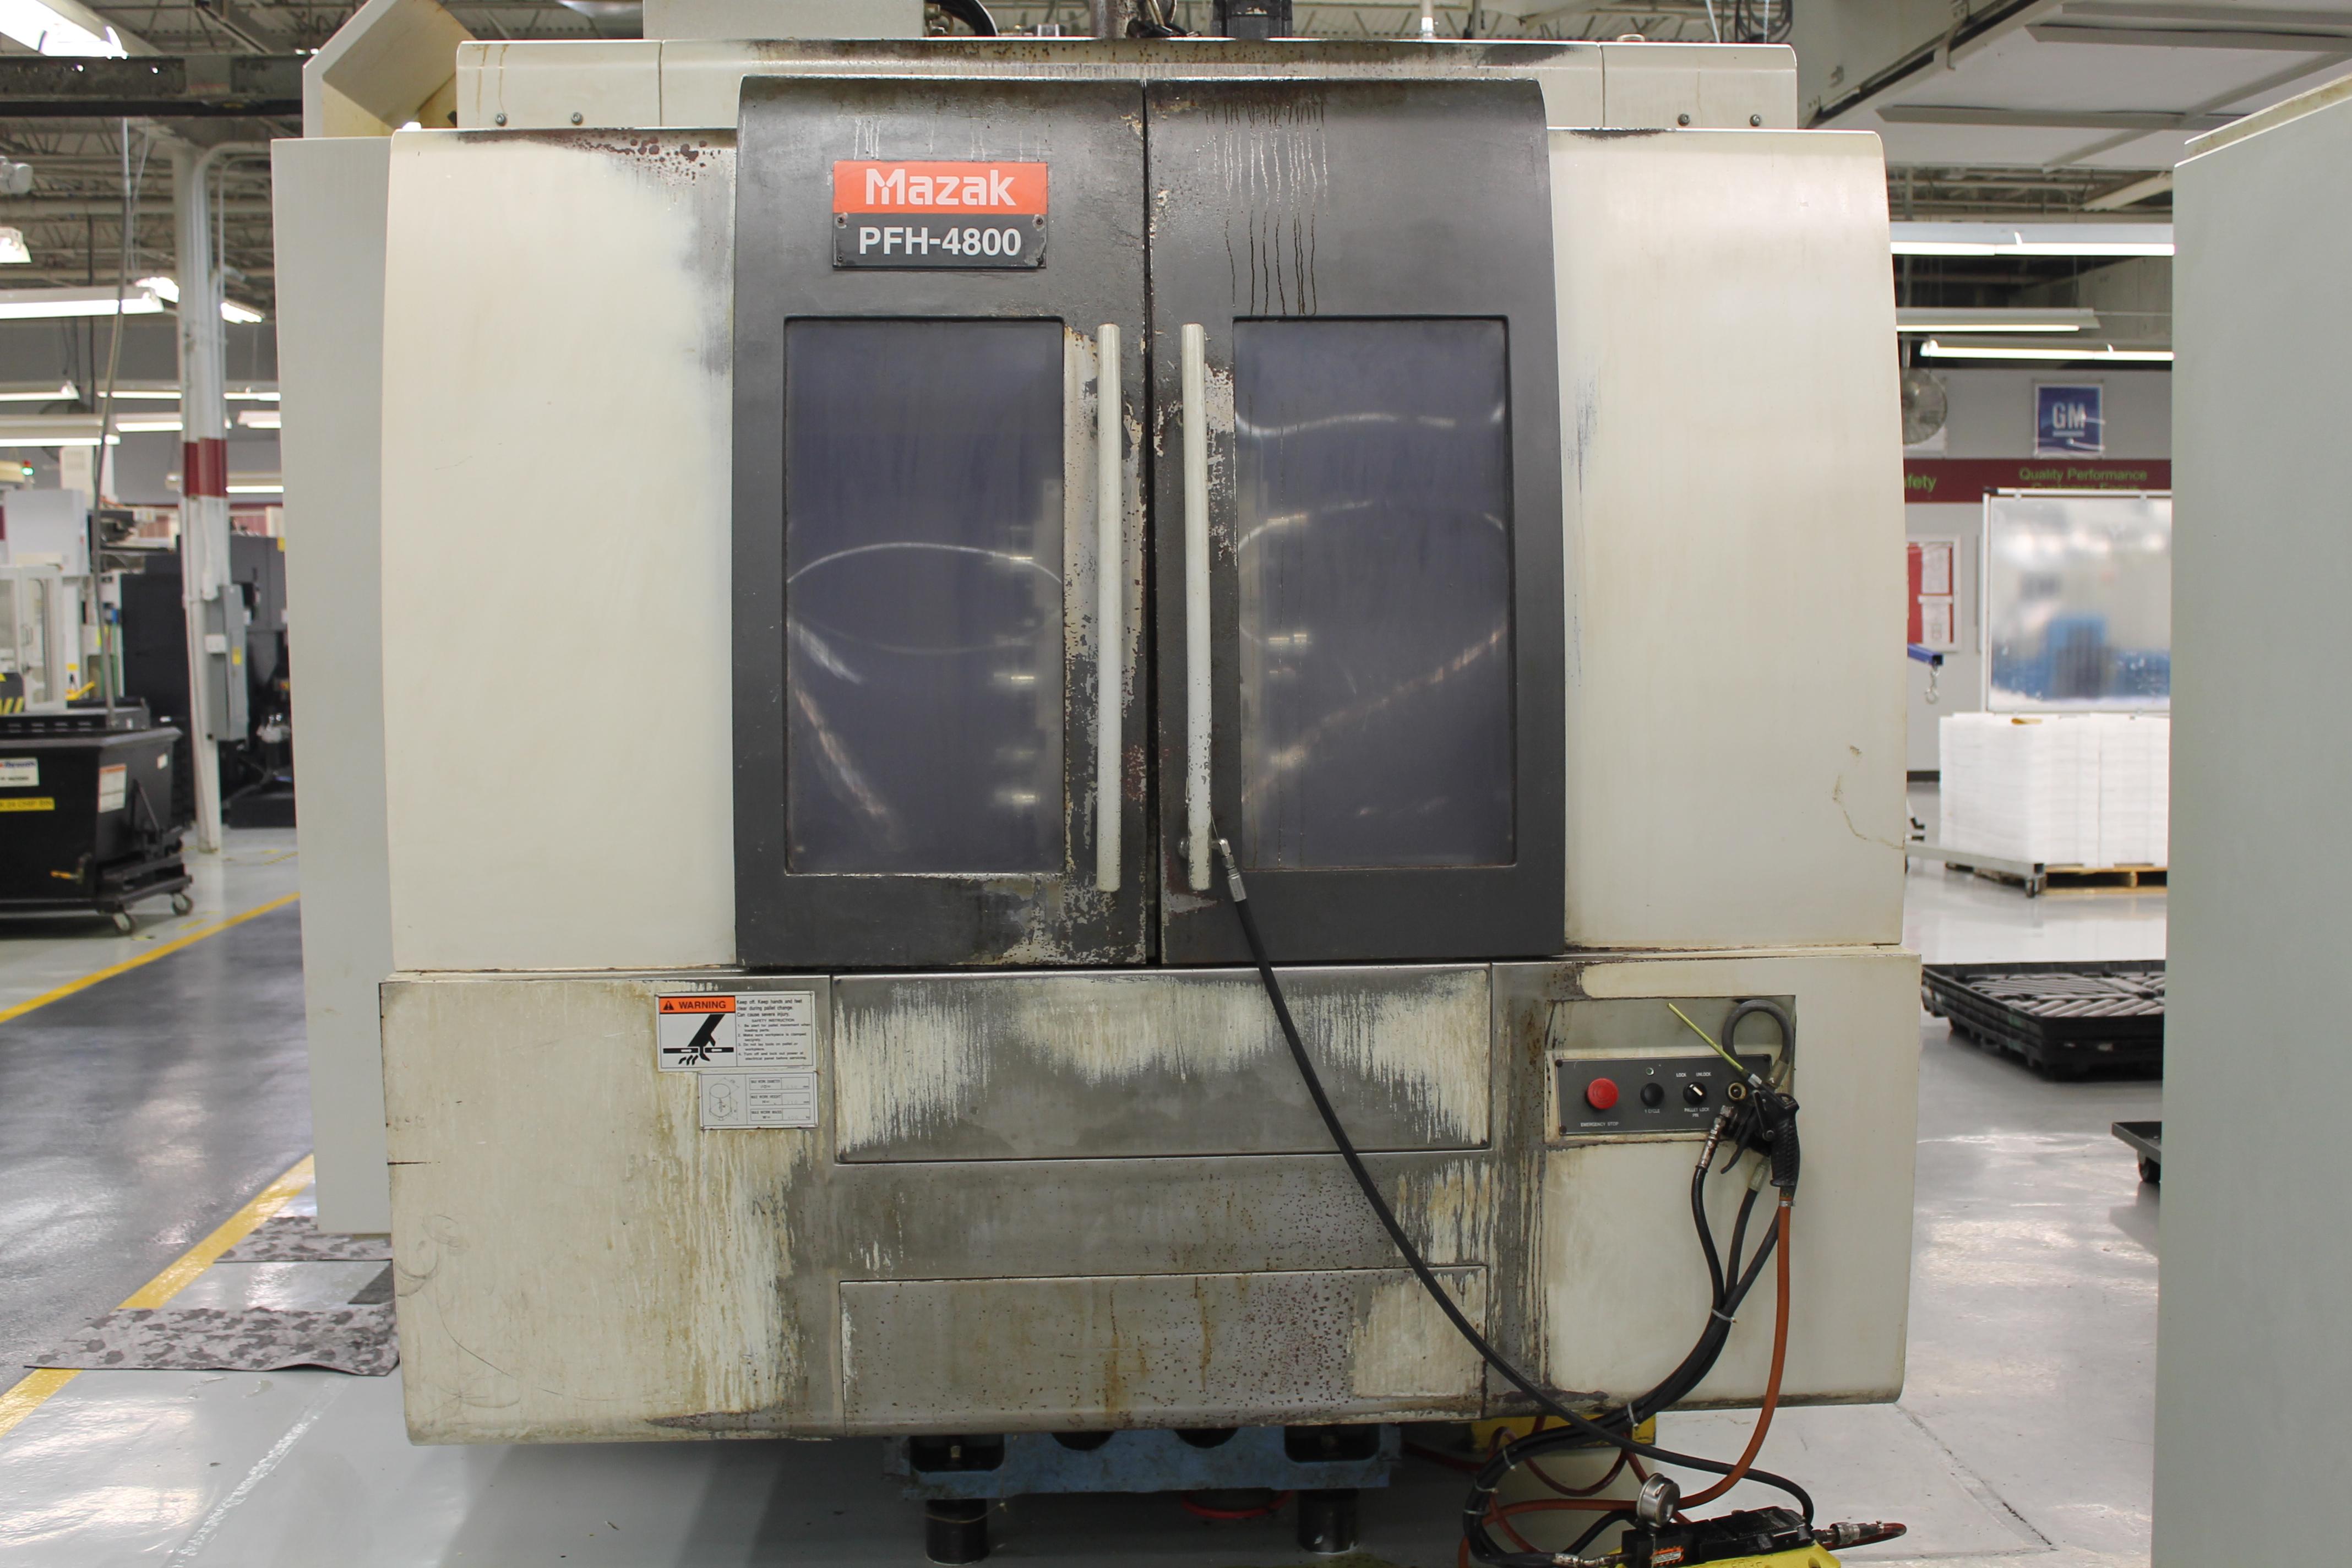 Used Mazak Horizontal Machining Center PFH4800 For Sale